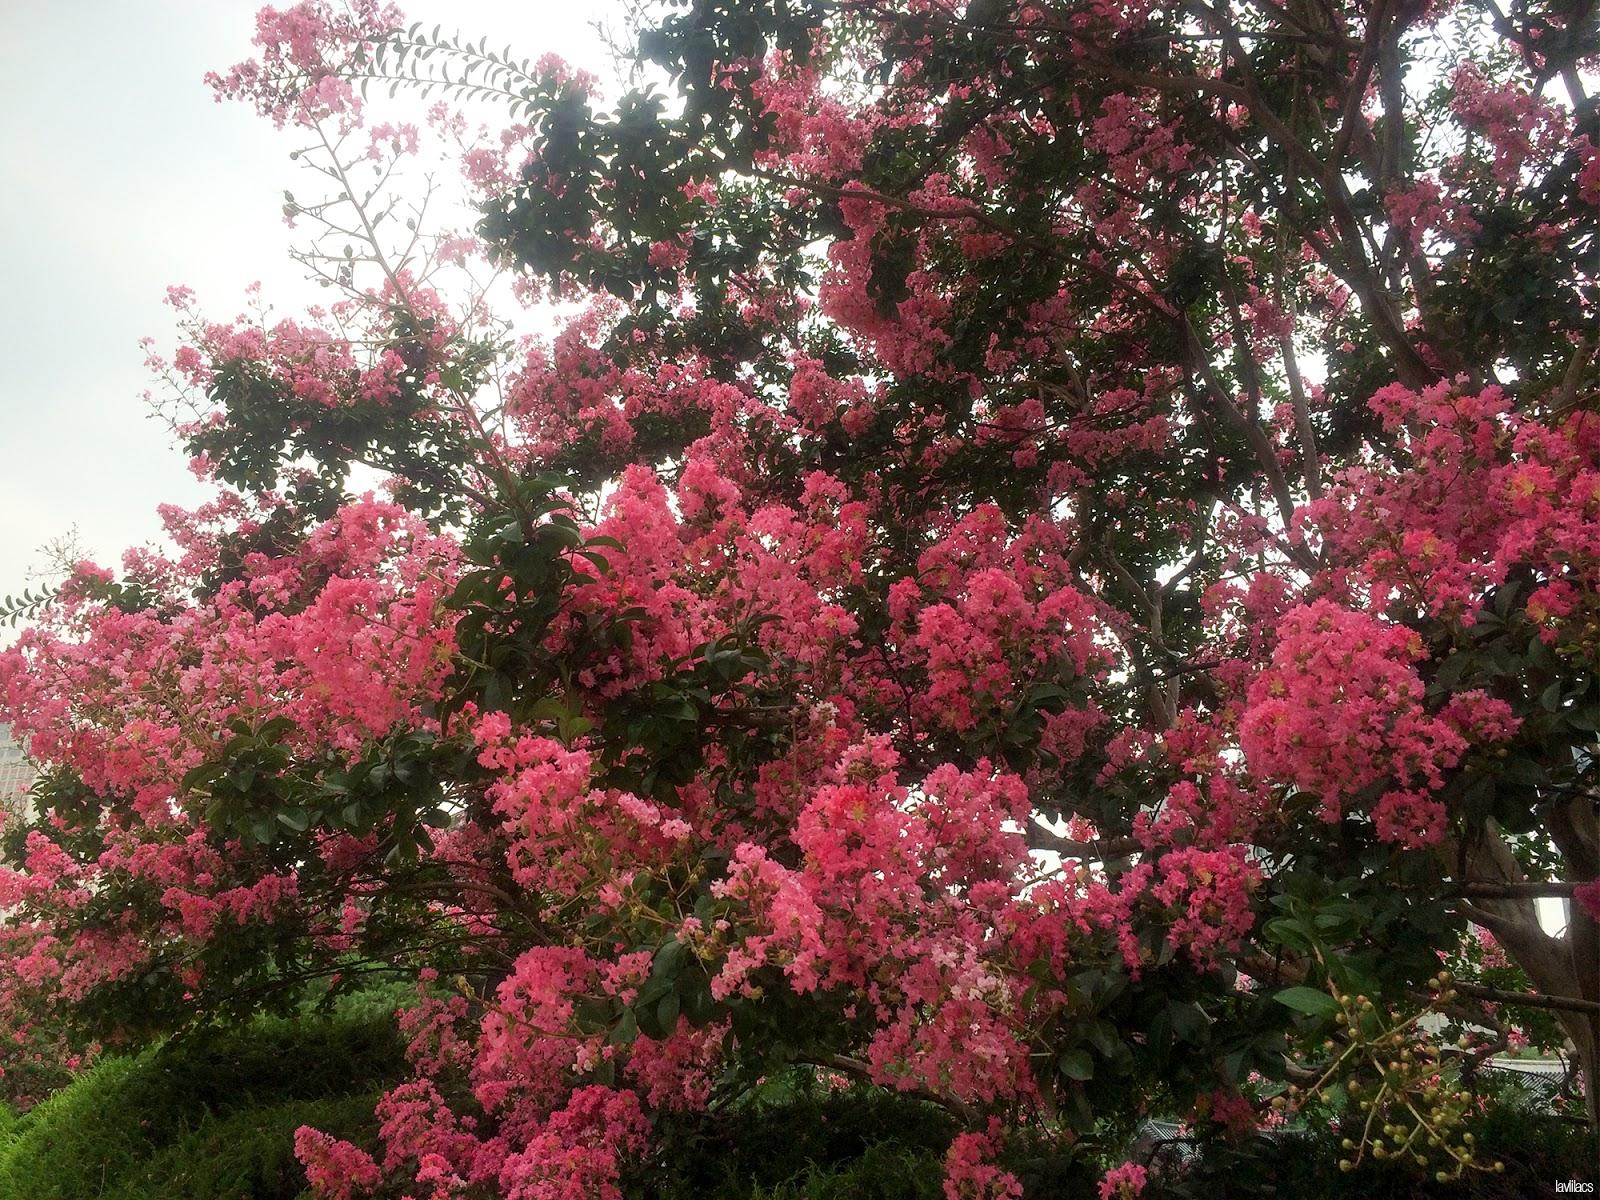 Seoul, Korea - Summer Study Abroad 2014 - Deoksugung 덕수궁 blooming trees